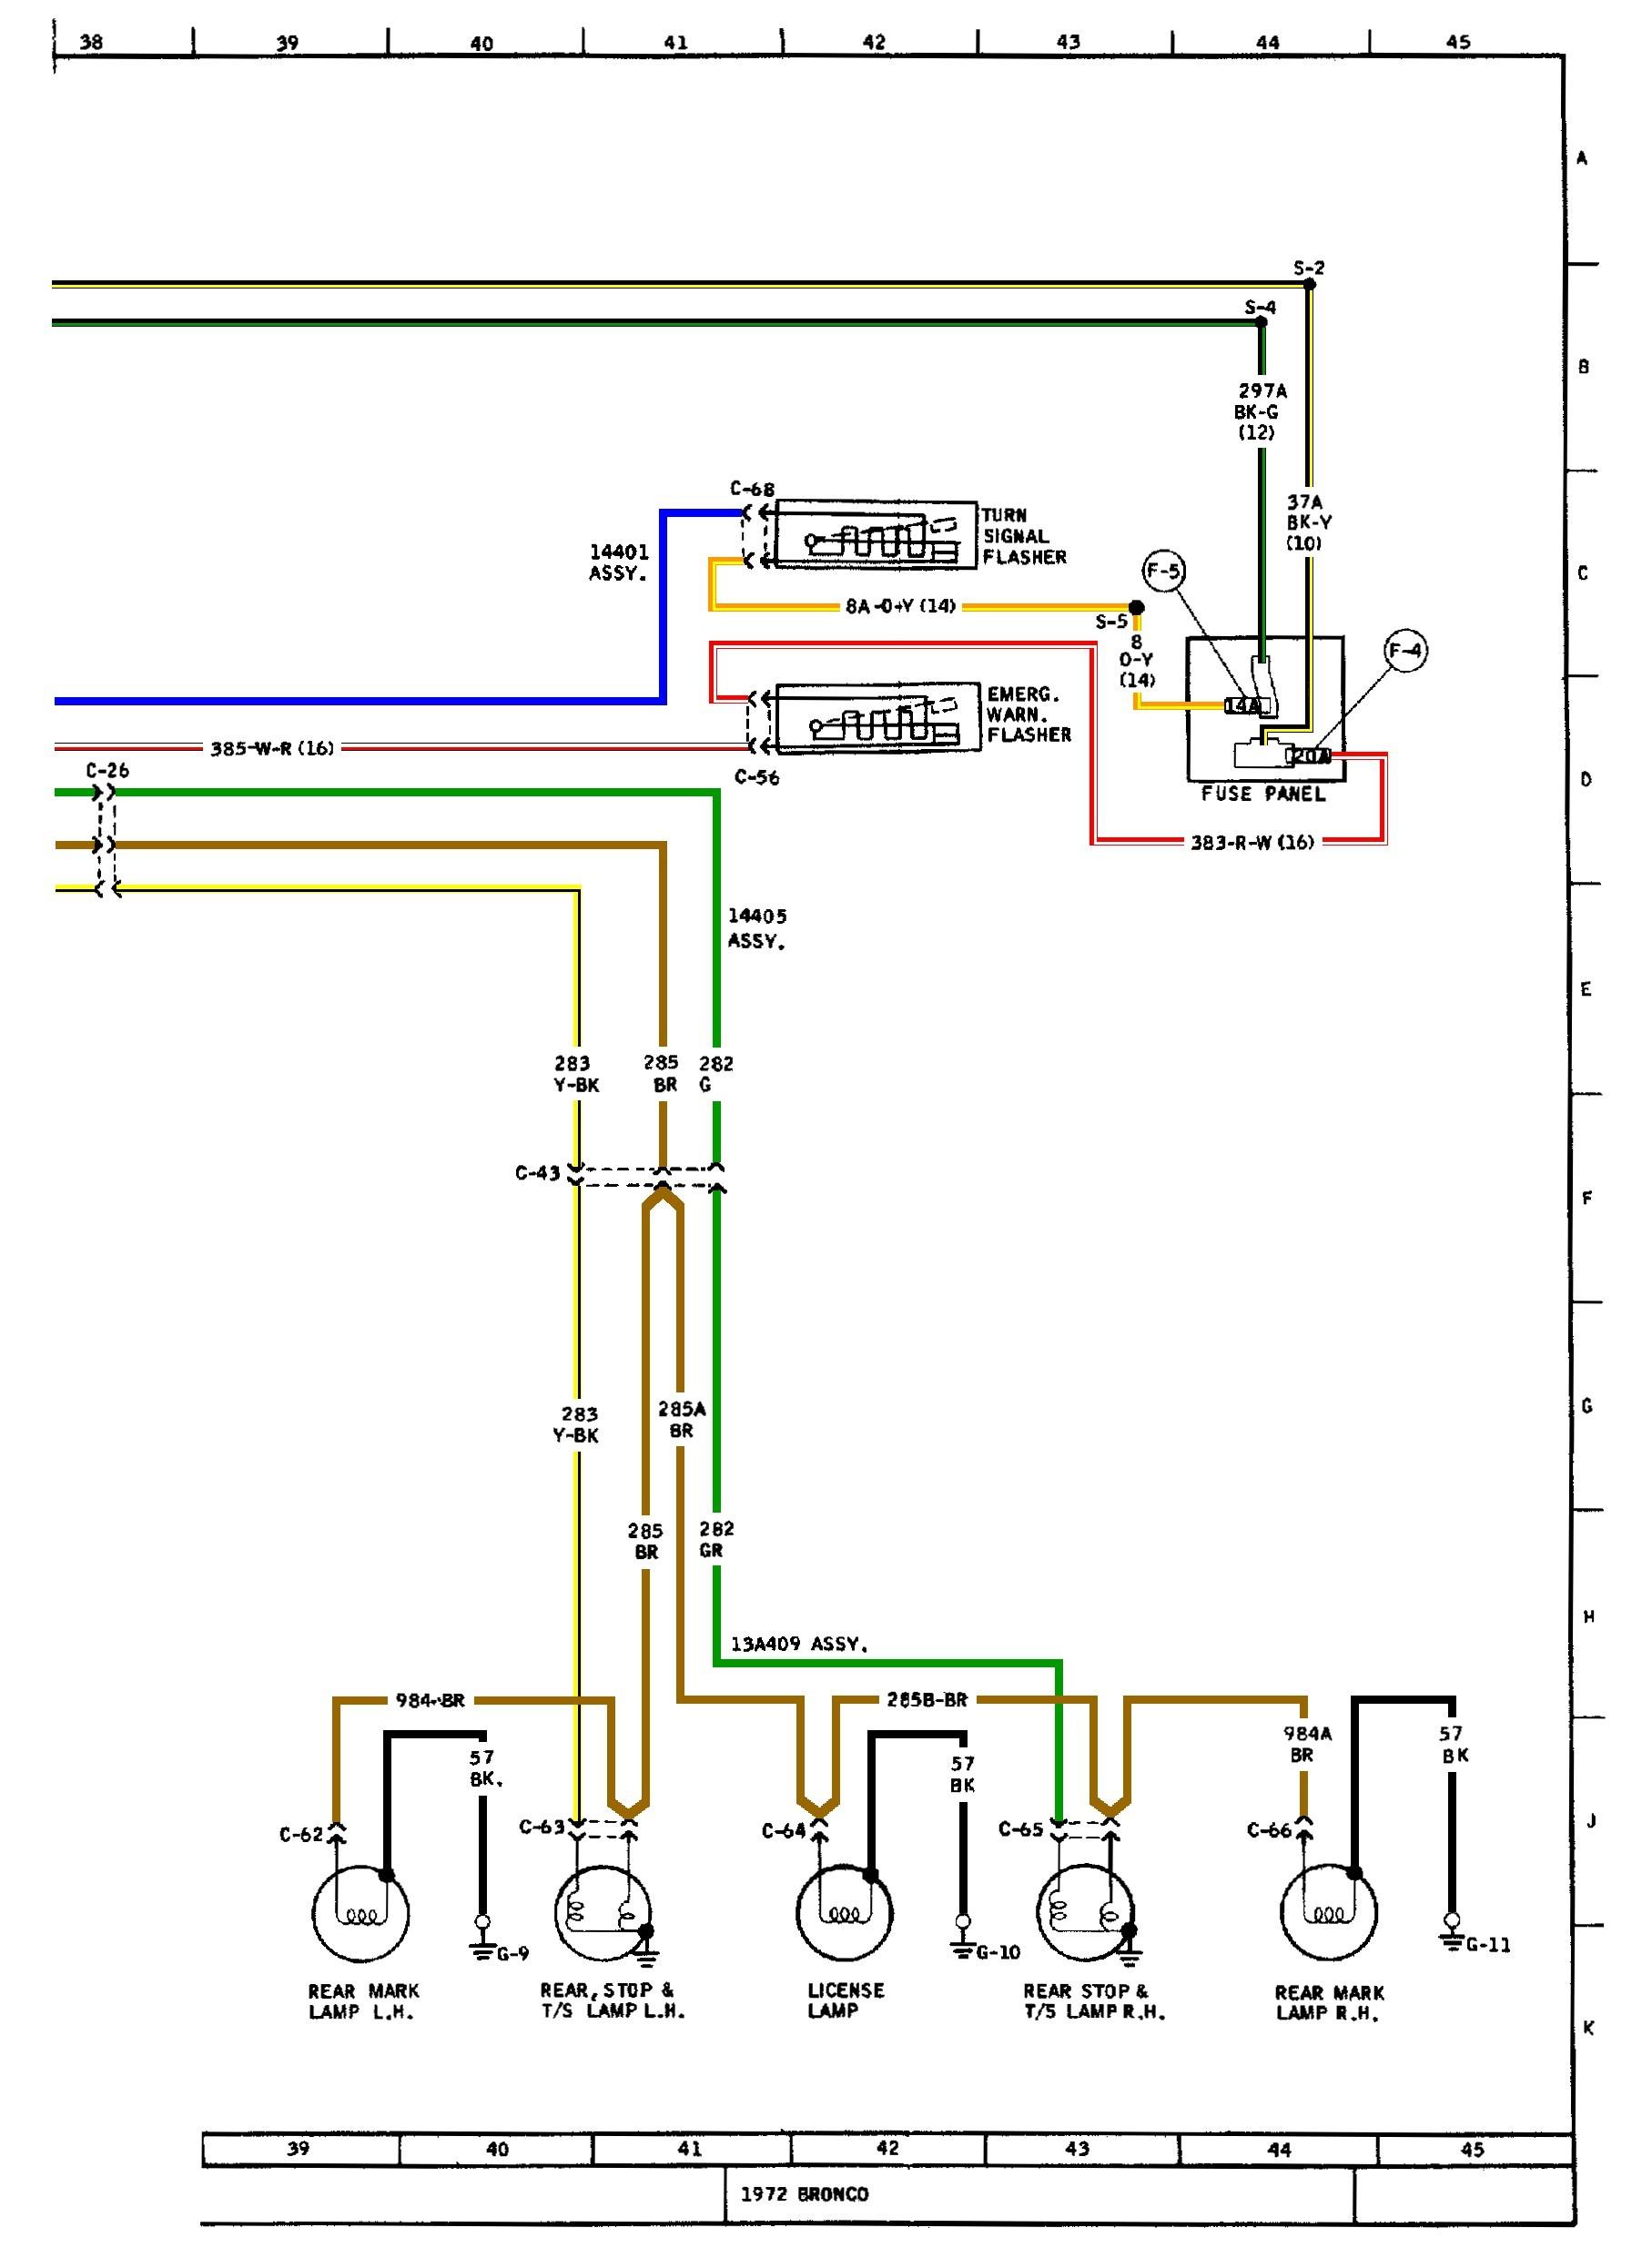 Turn Signal Switch Diagram Inspirational Turn Signal Wiring Diagram Diagram Of Turn Signal Switch Diagram